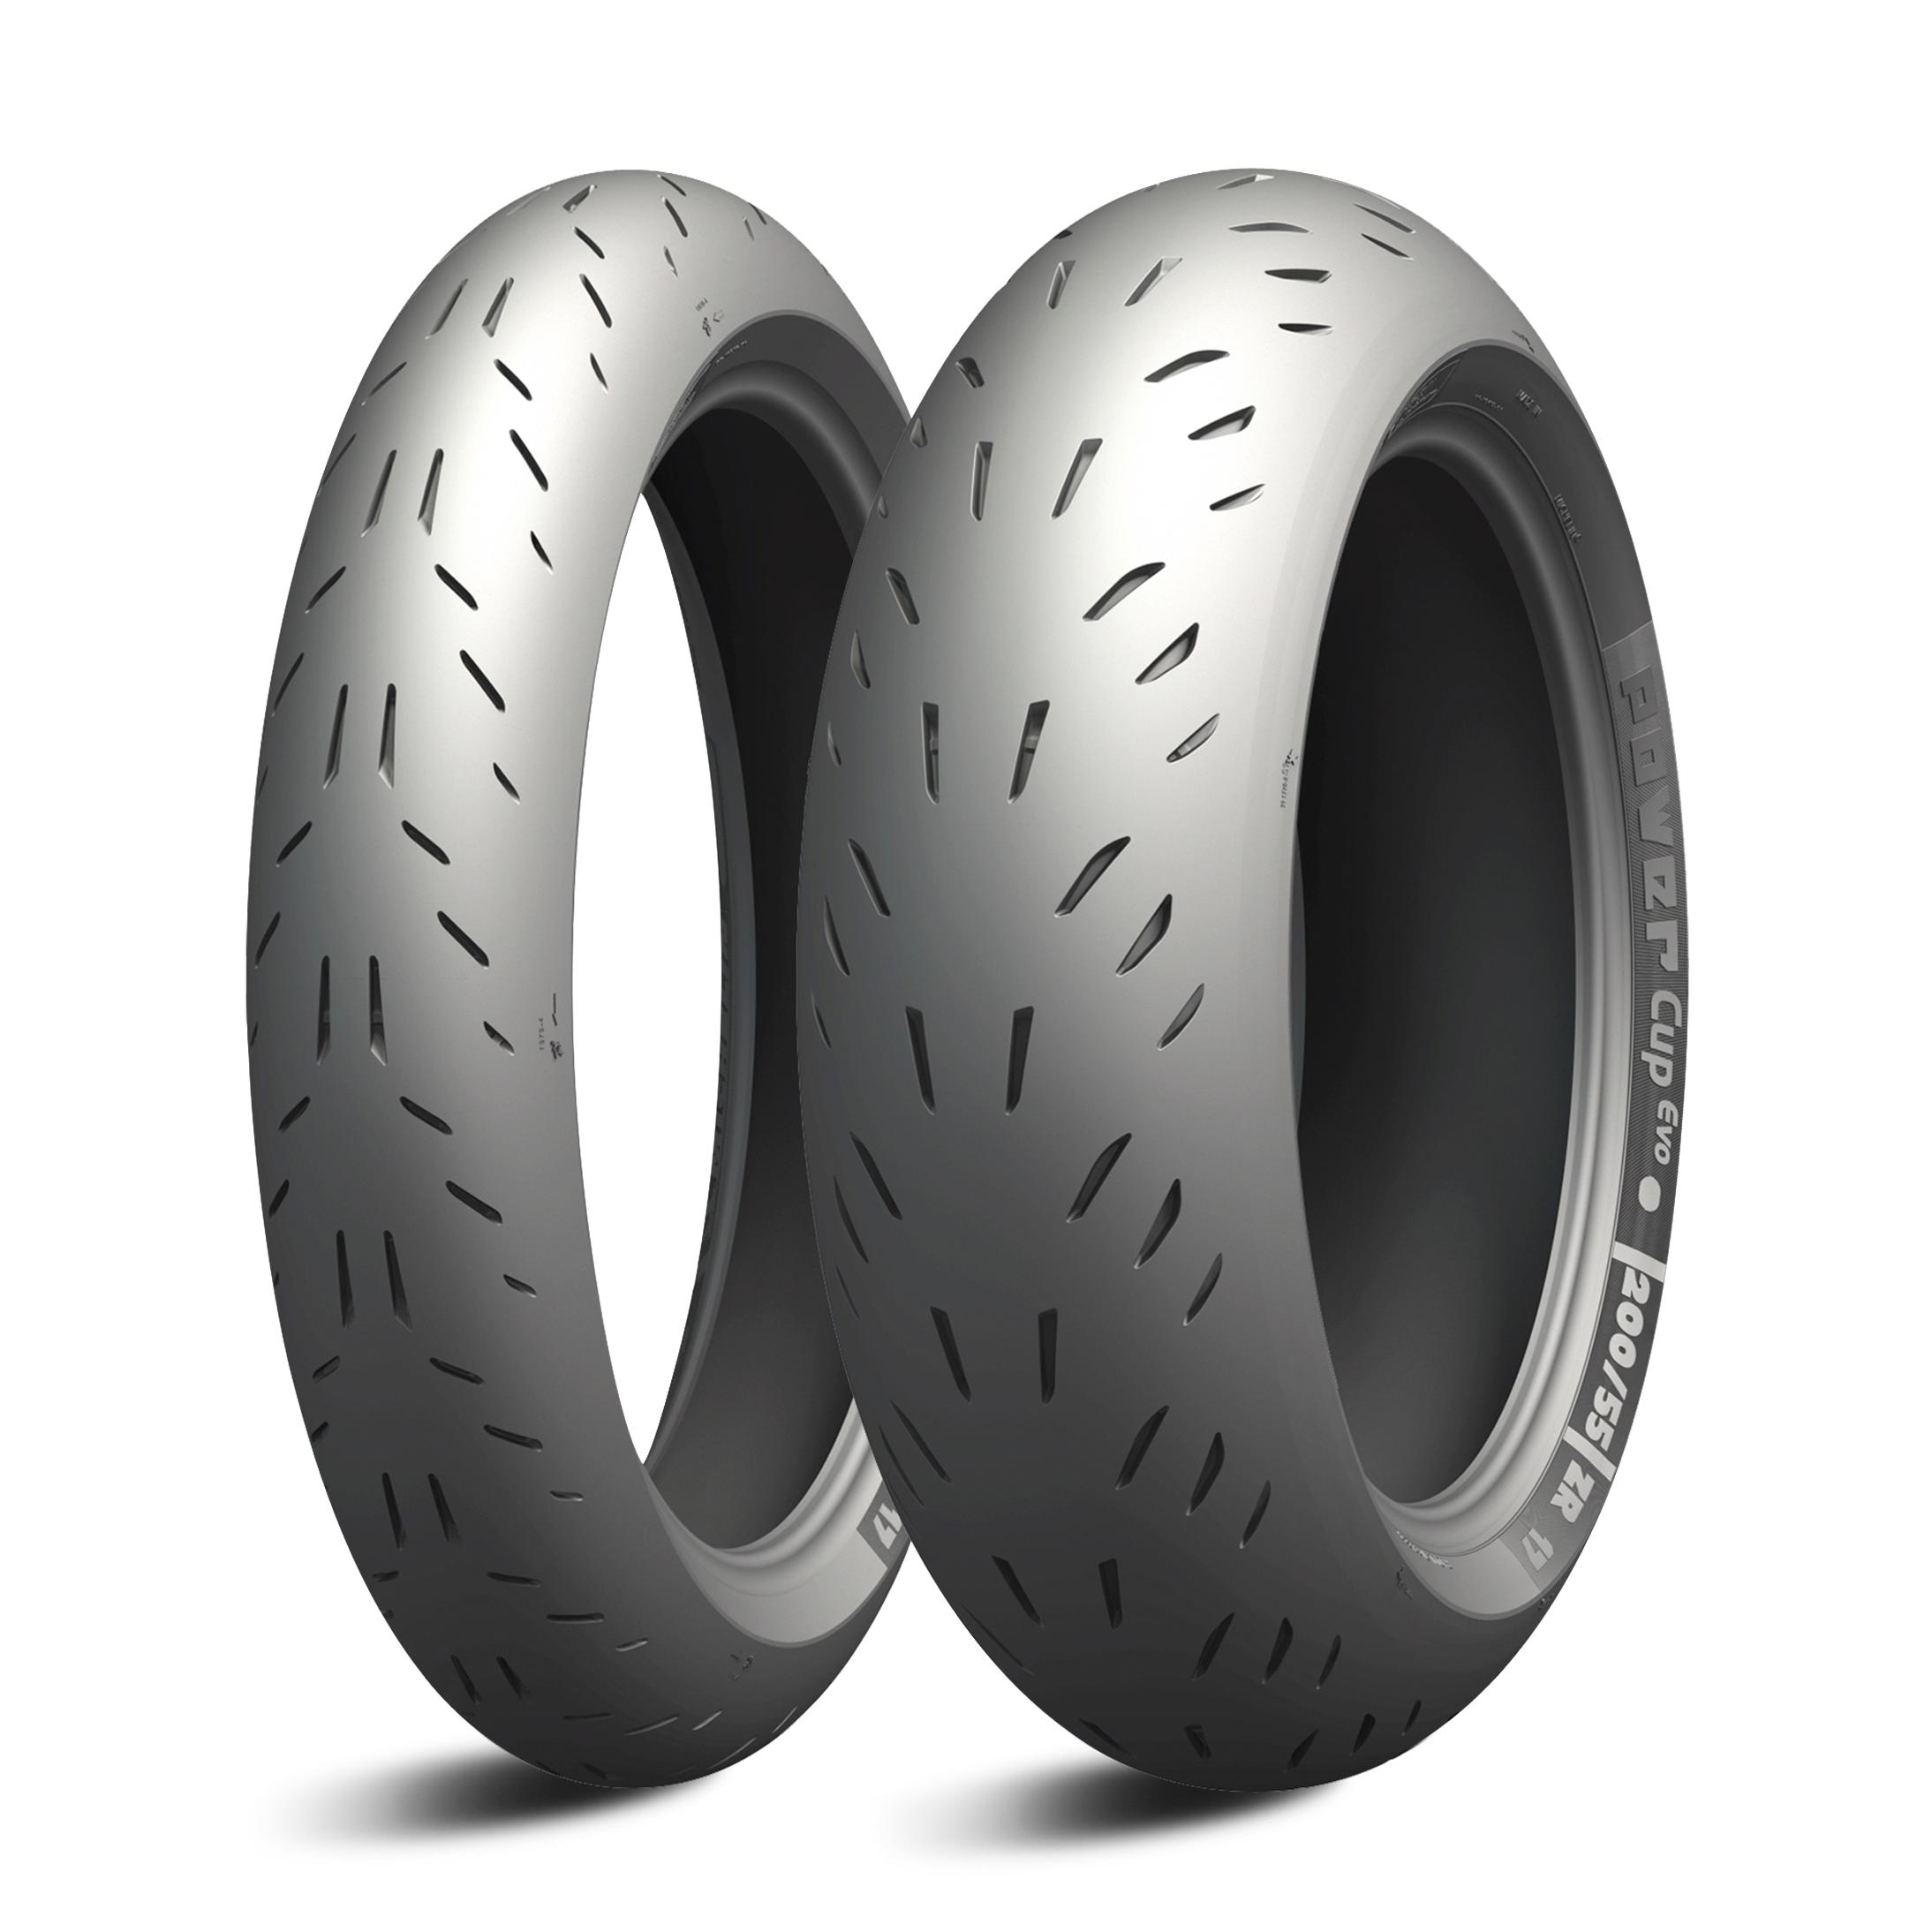 Michelin Pneu Arrière Michelin Power Cup Evo Racing